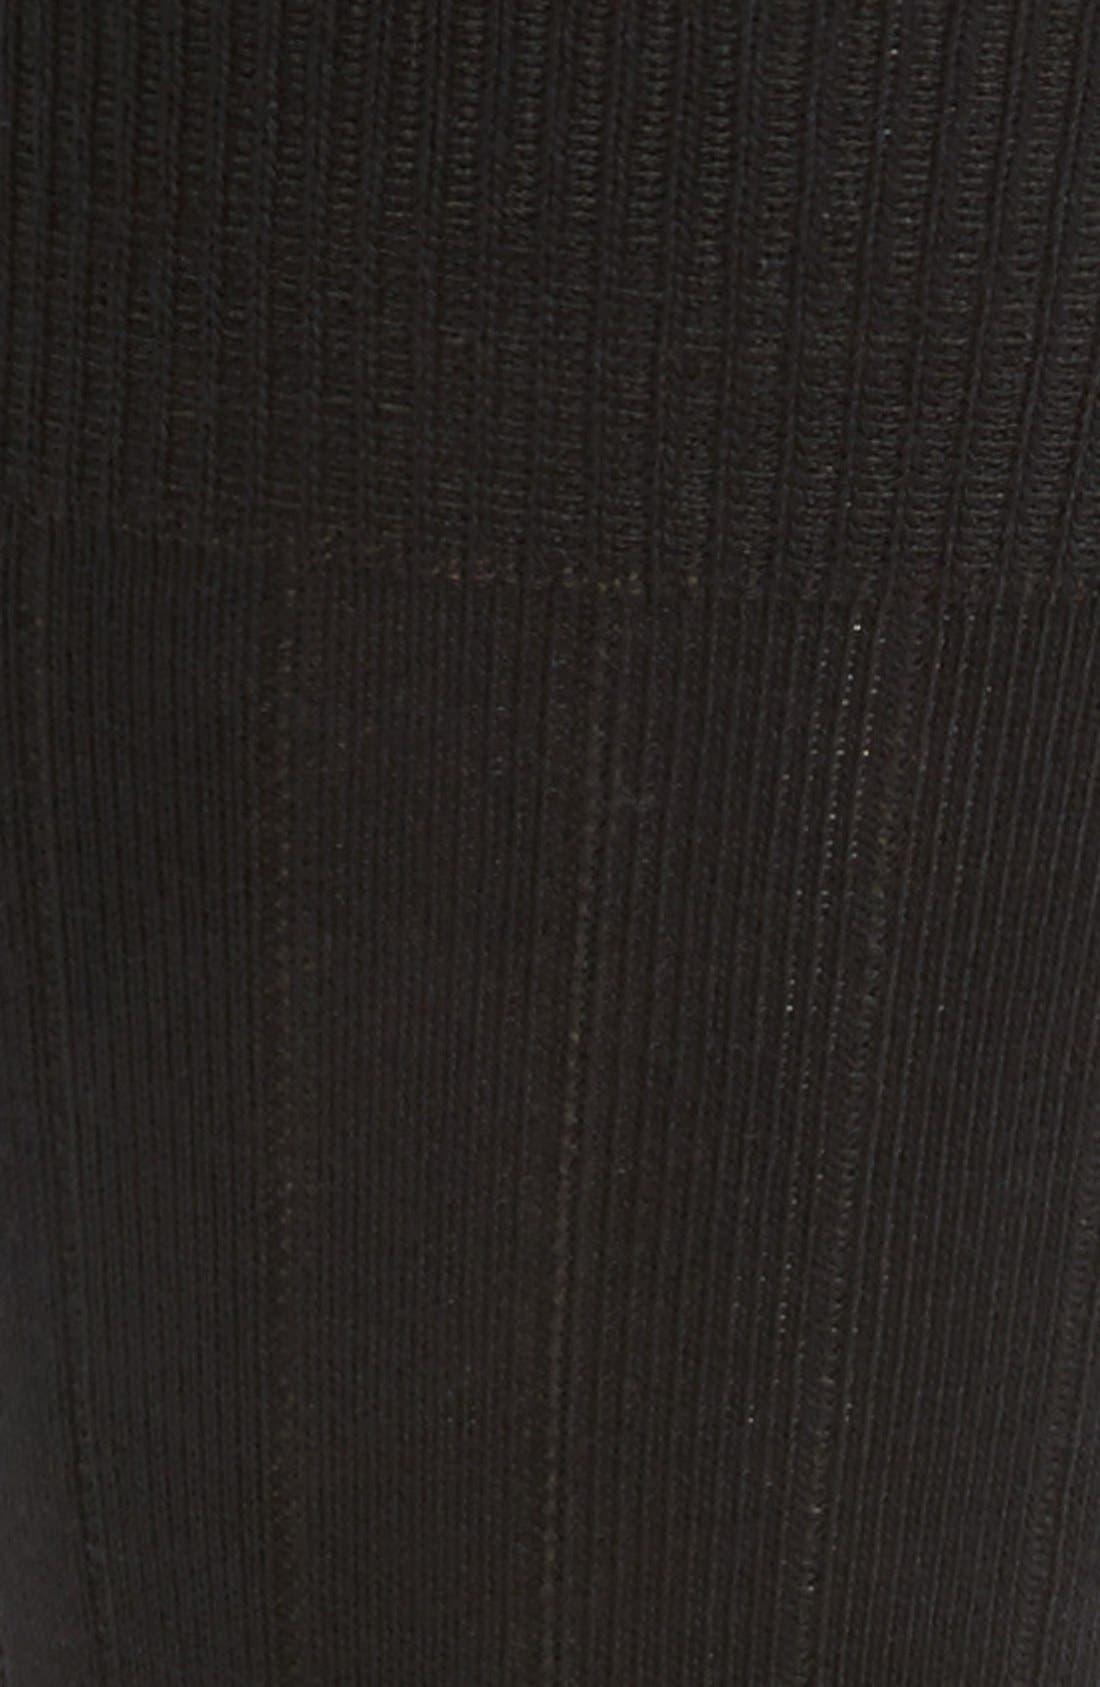 Alternate Image 2  - Cole Haan Pima Cotton Blend Socks (3-Pack)